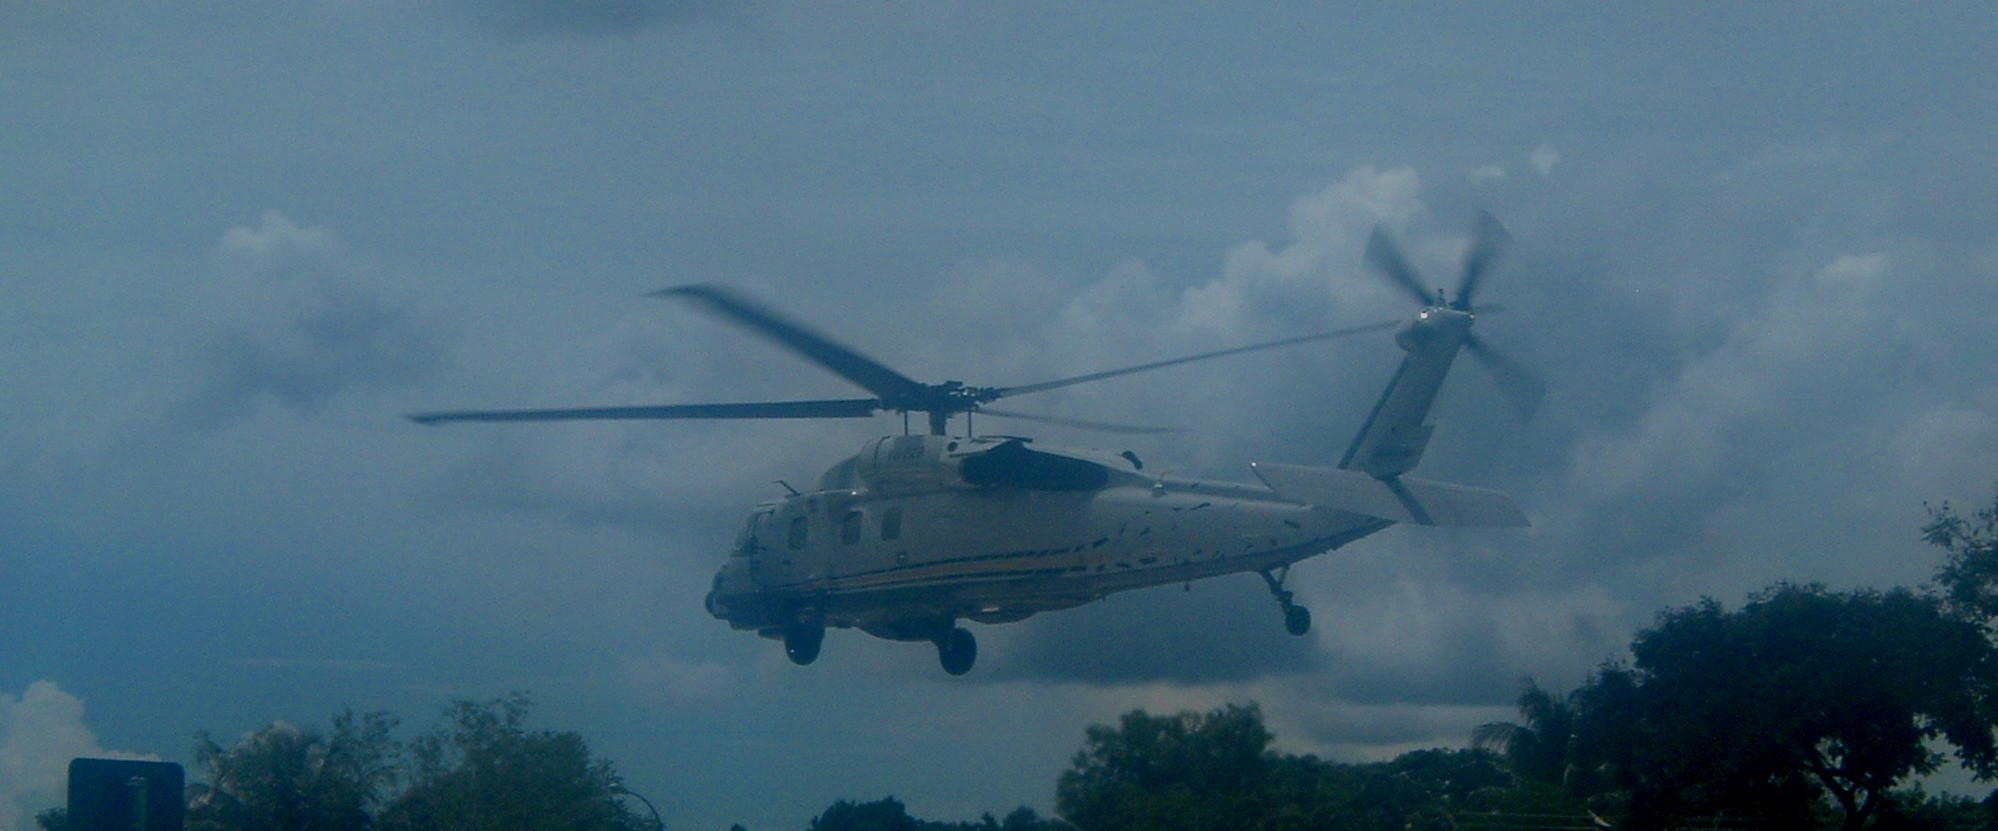 sultan's chopper.JPG